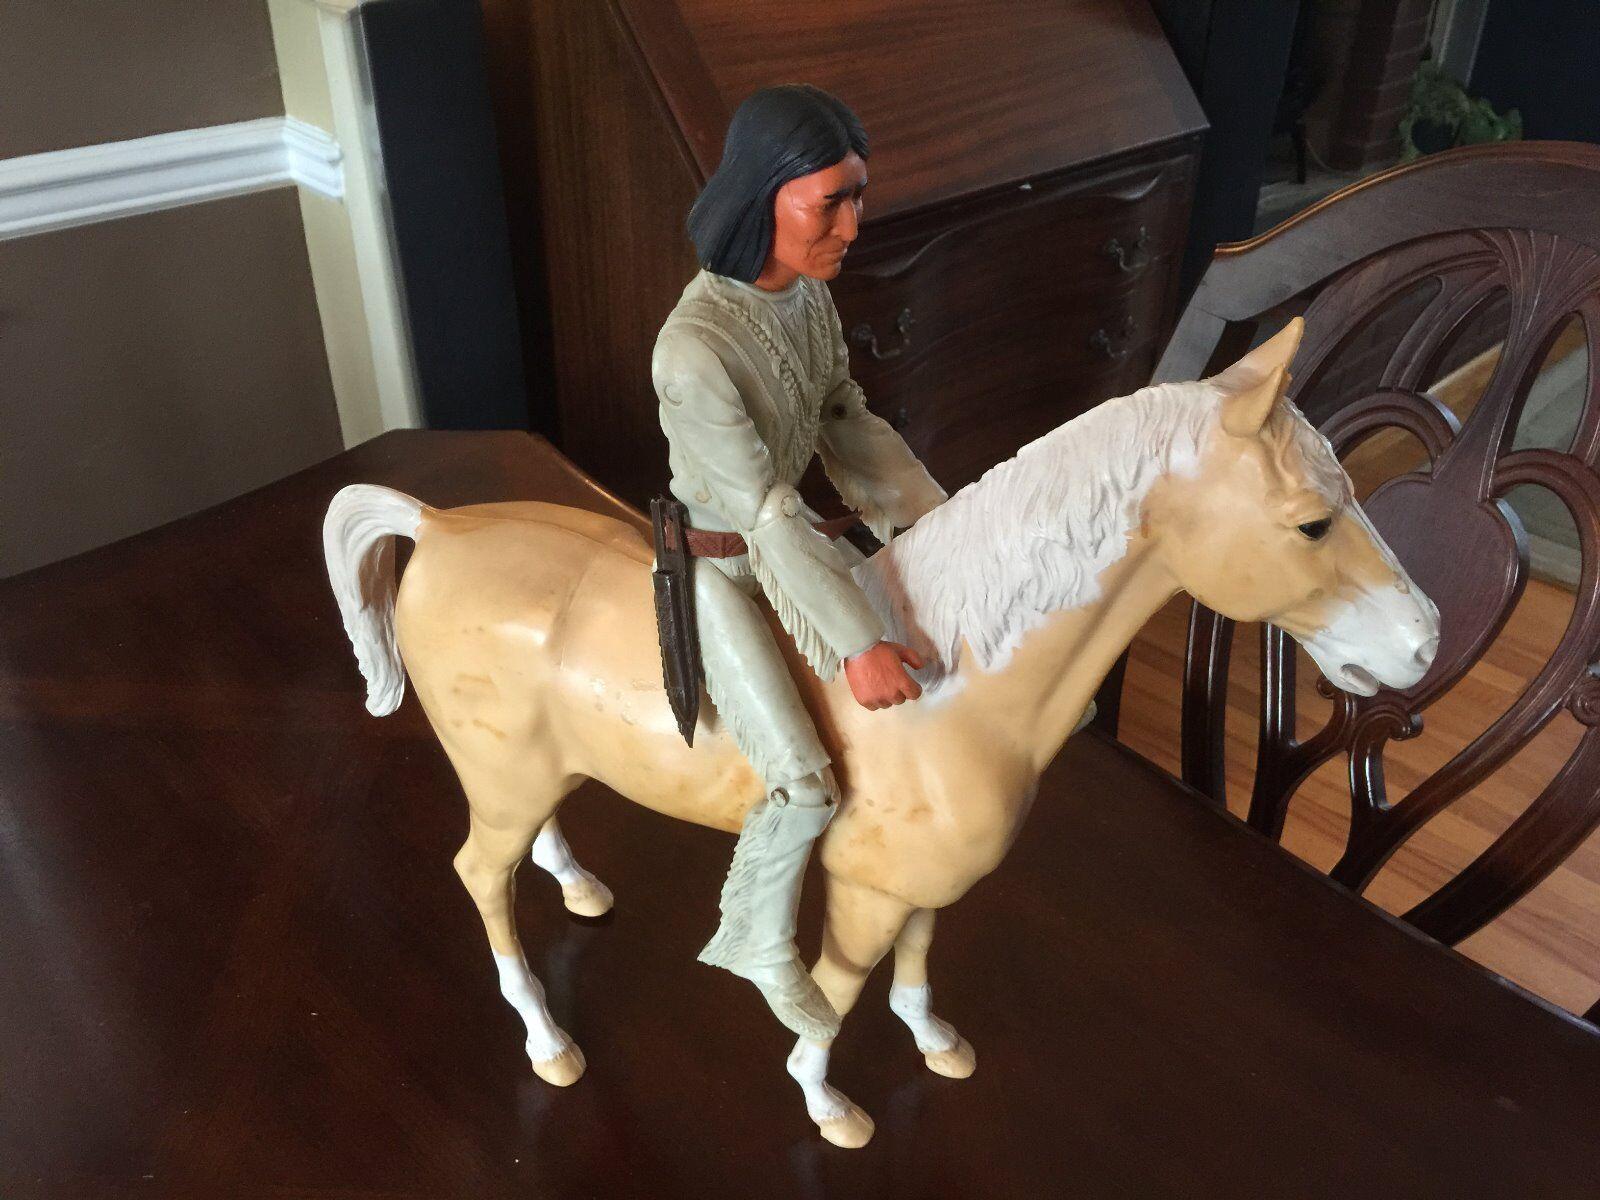 Tonto, marx spielzeug 1967 mit pferd